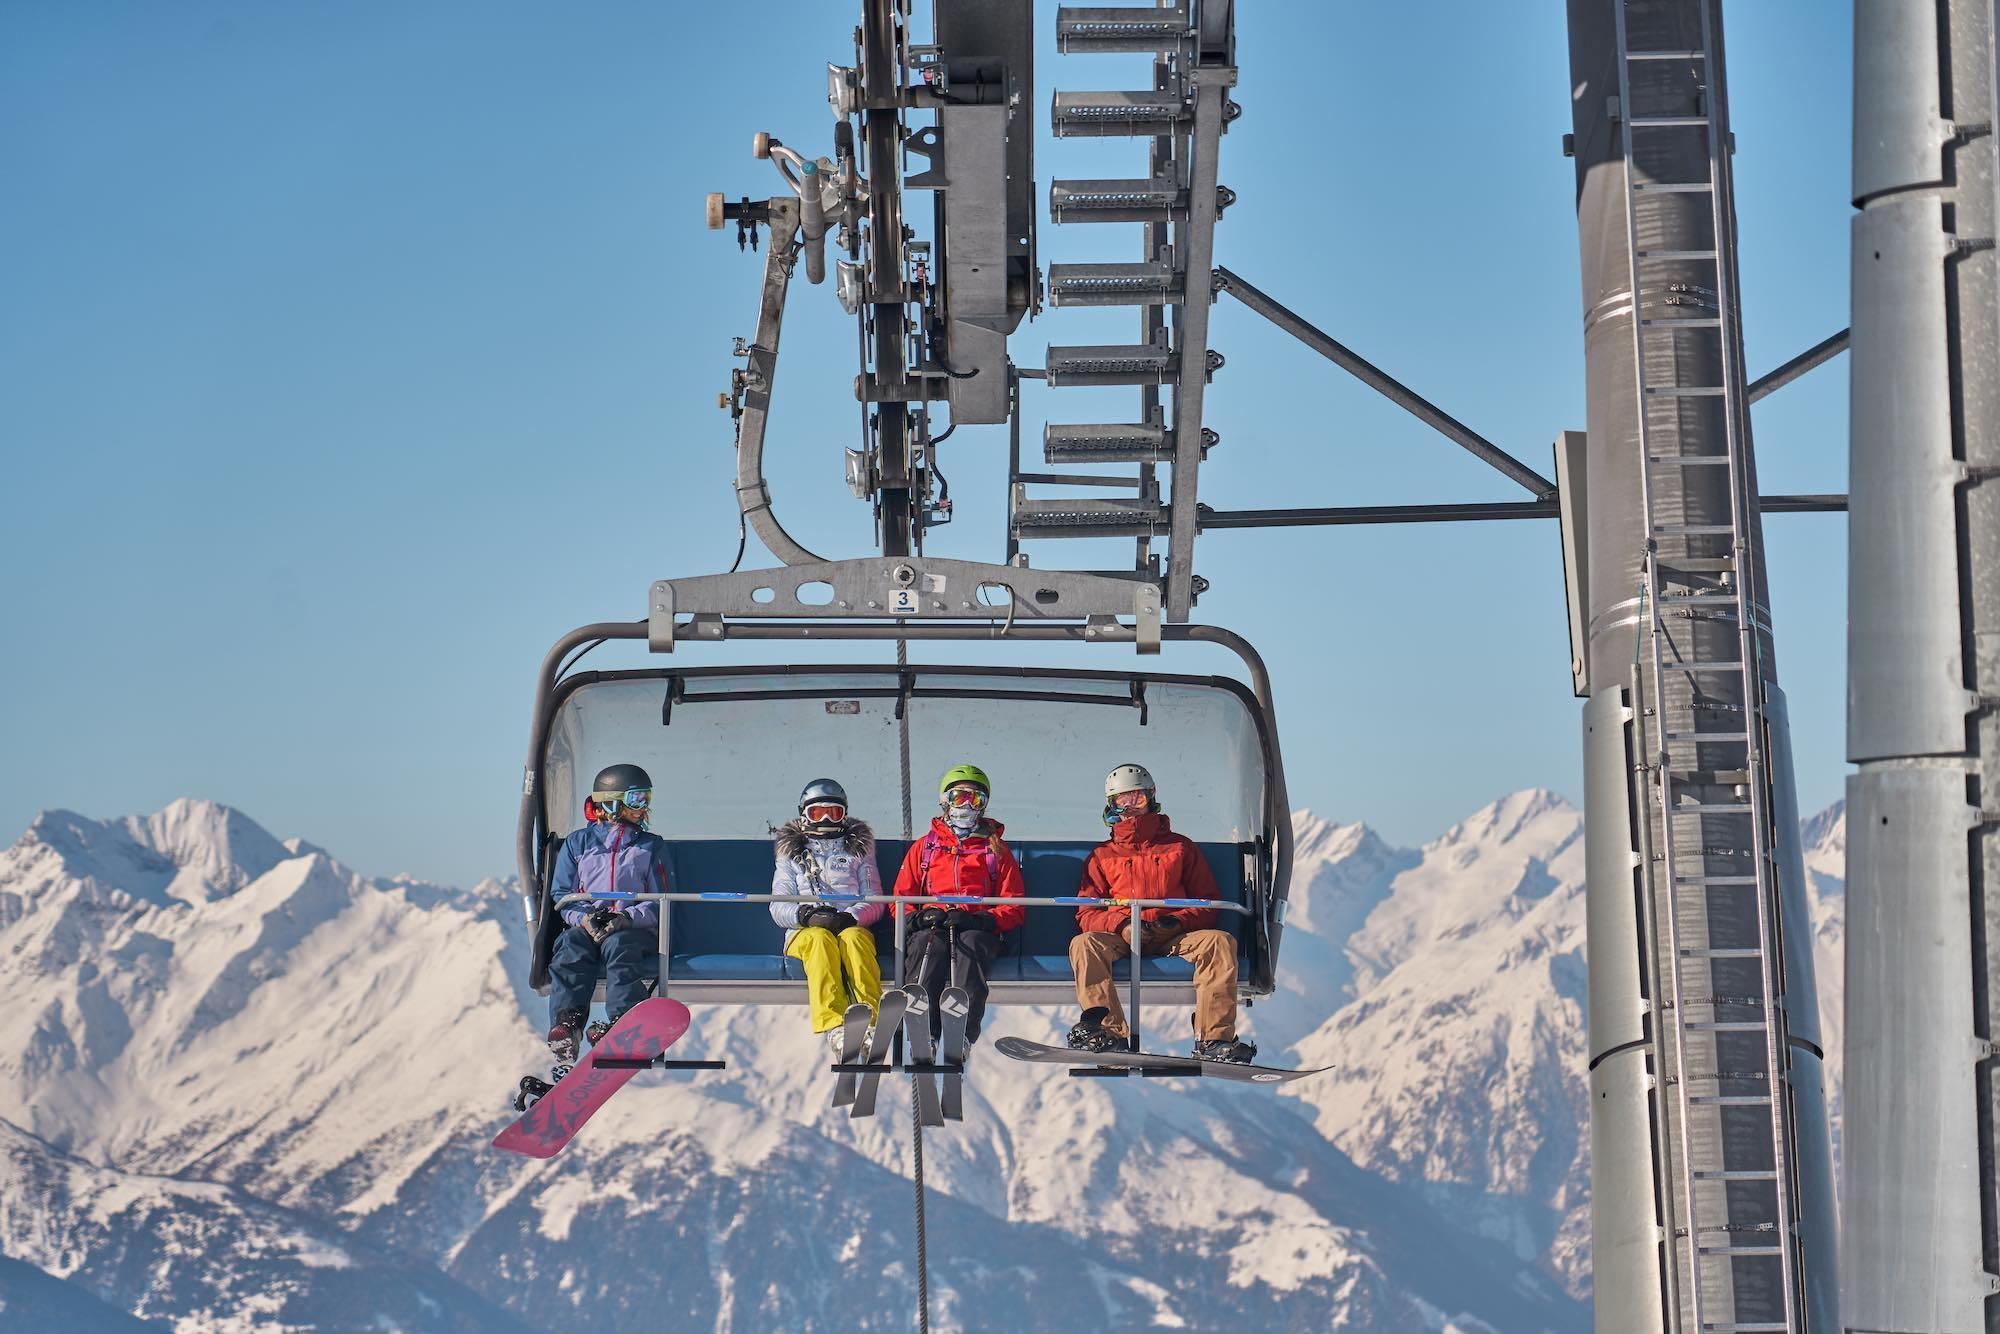 Ski Lift in the GG resort Austria